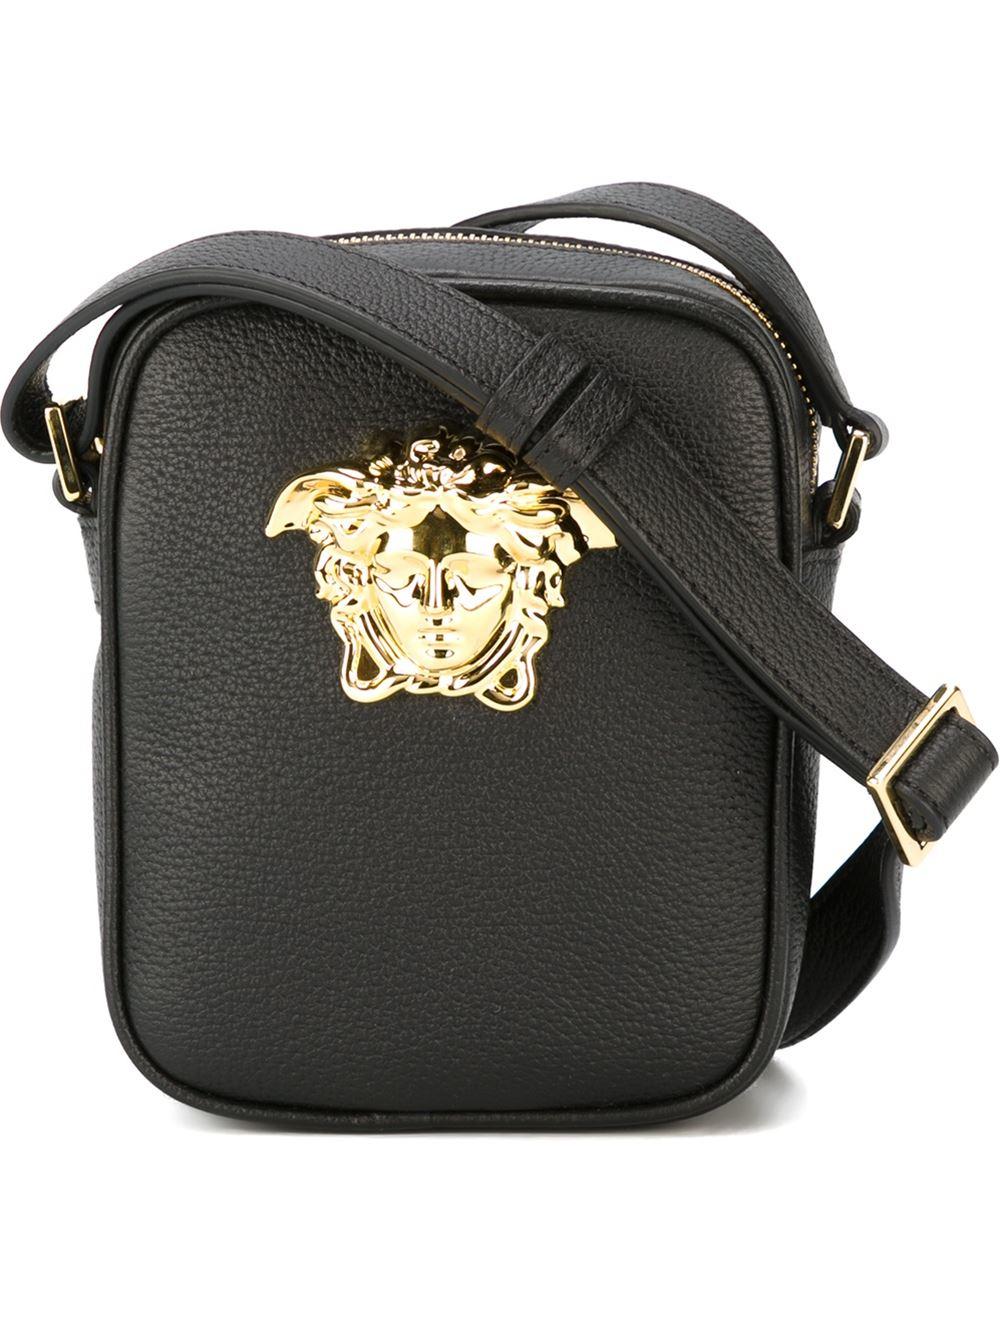 Lyst - Versace Medusa Messenger Bag in Black for Men 23c79791aab